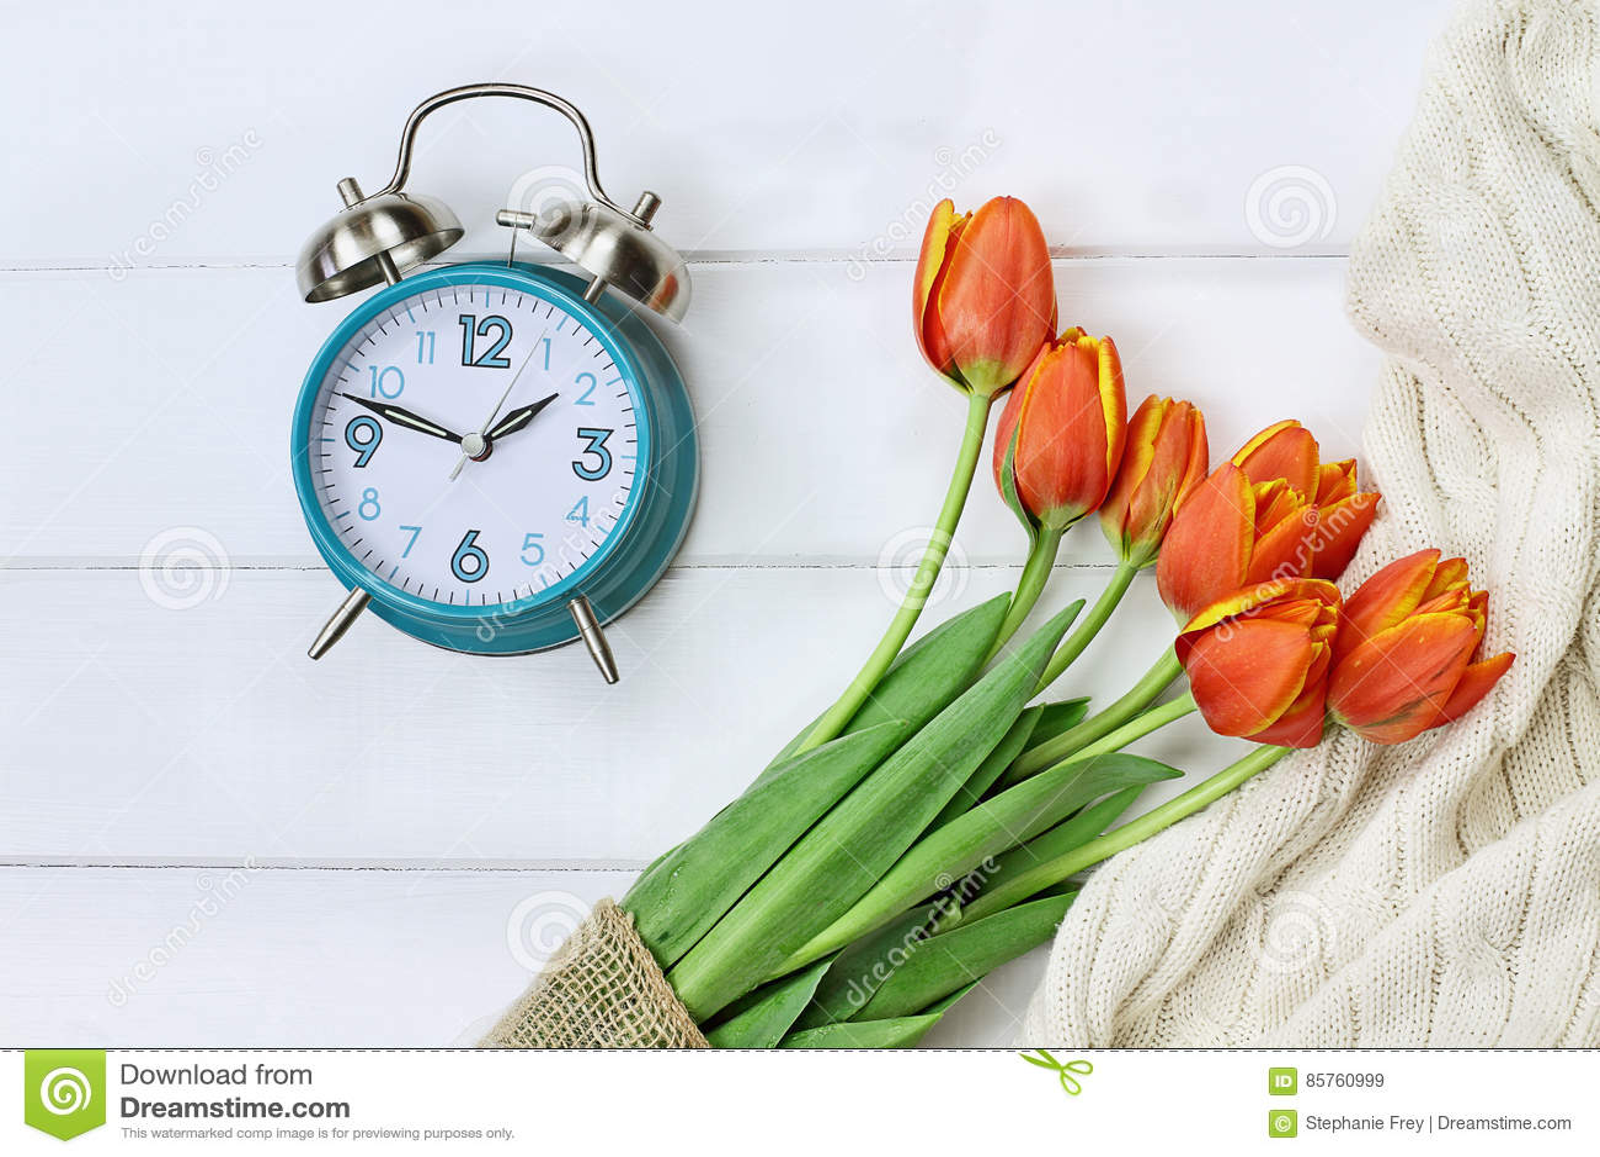 Spring Time Change Daylight Savings Stock Image - Image of aerial